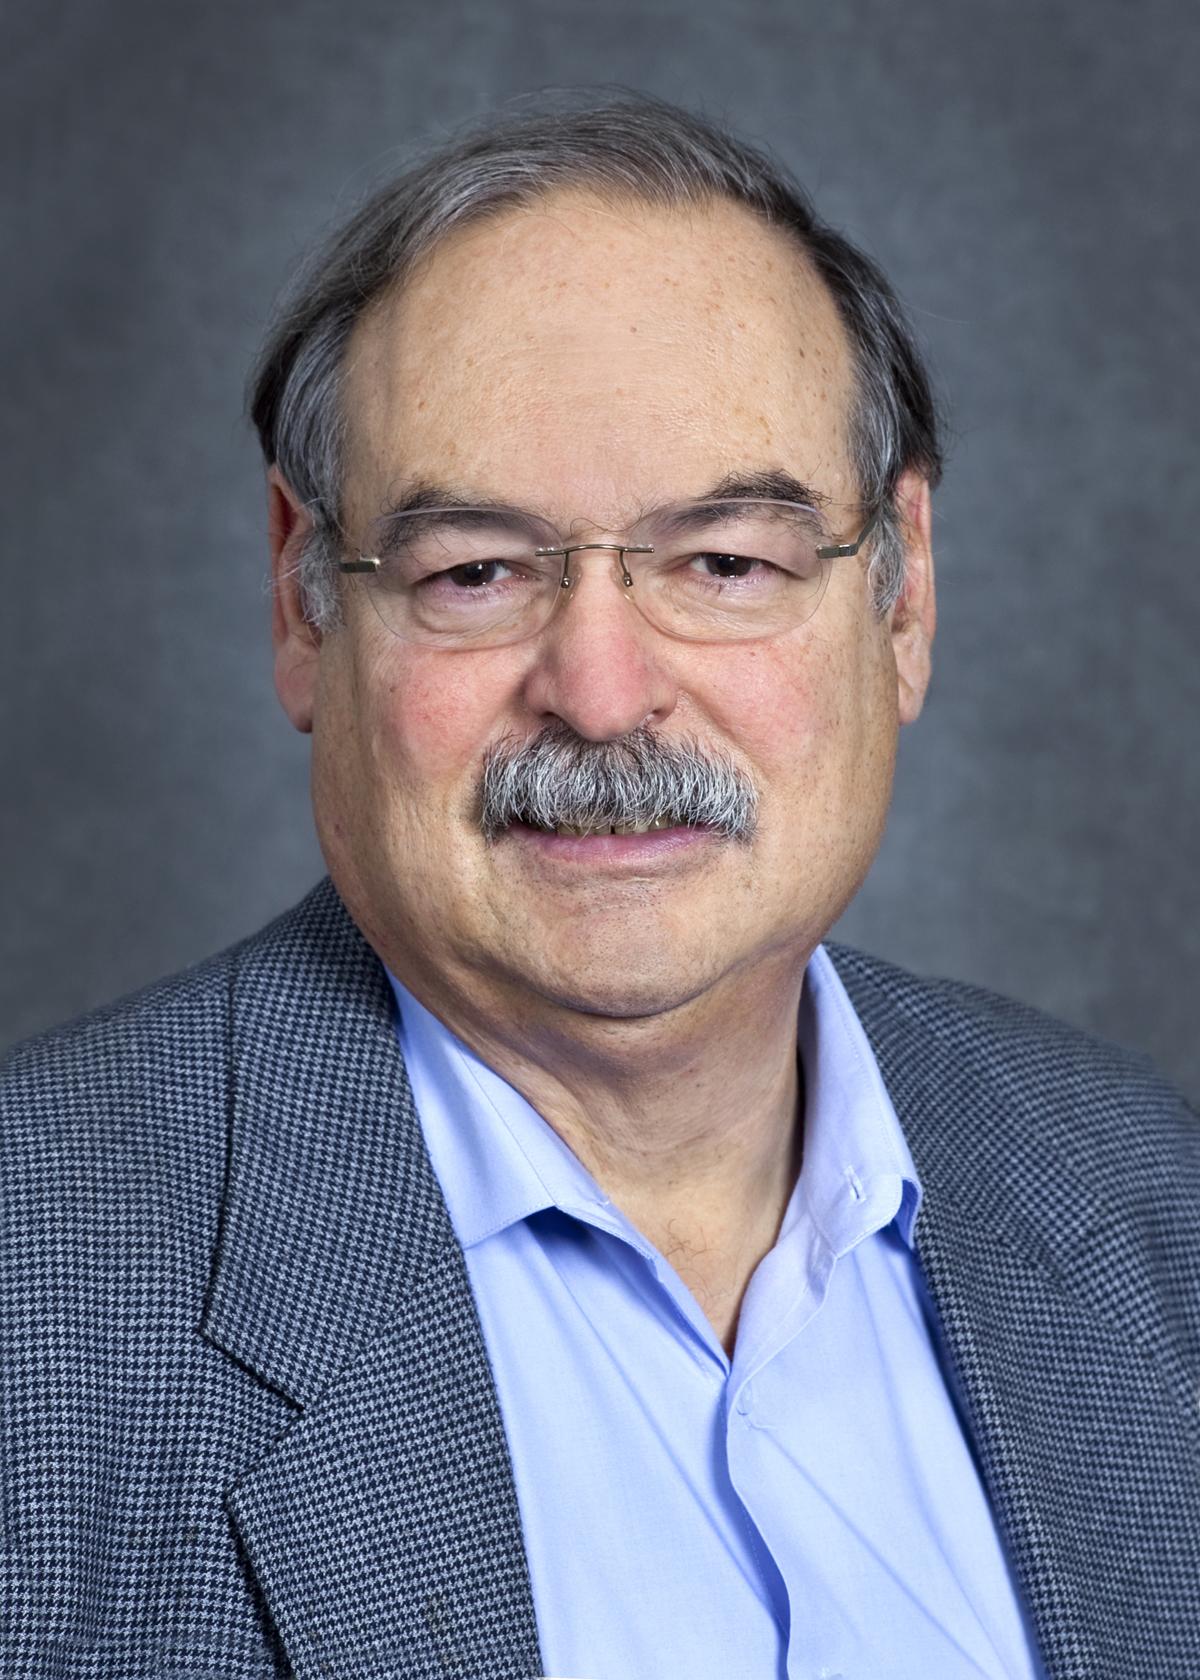 Portrait of Mark Levine